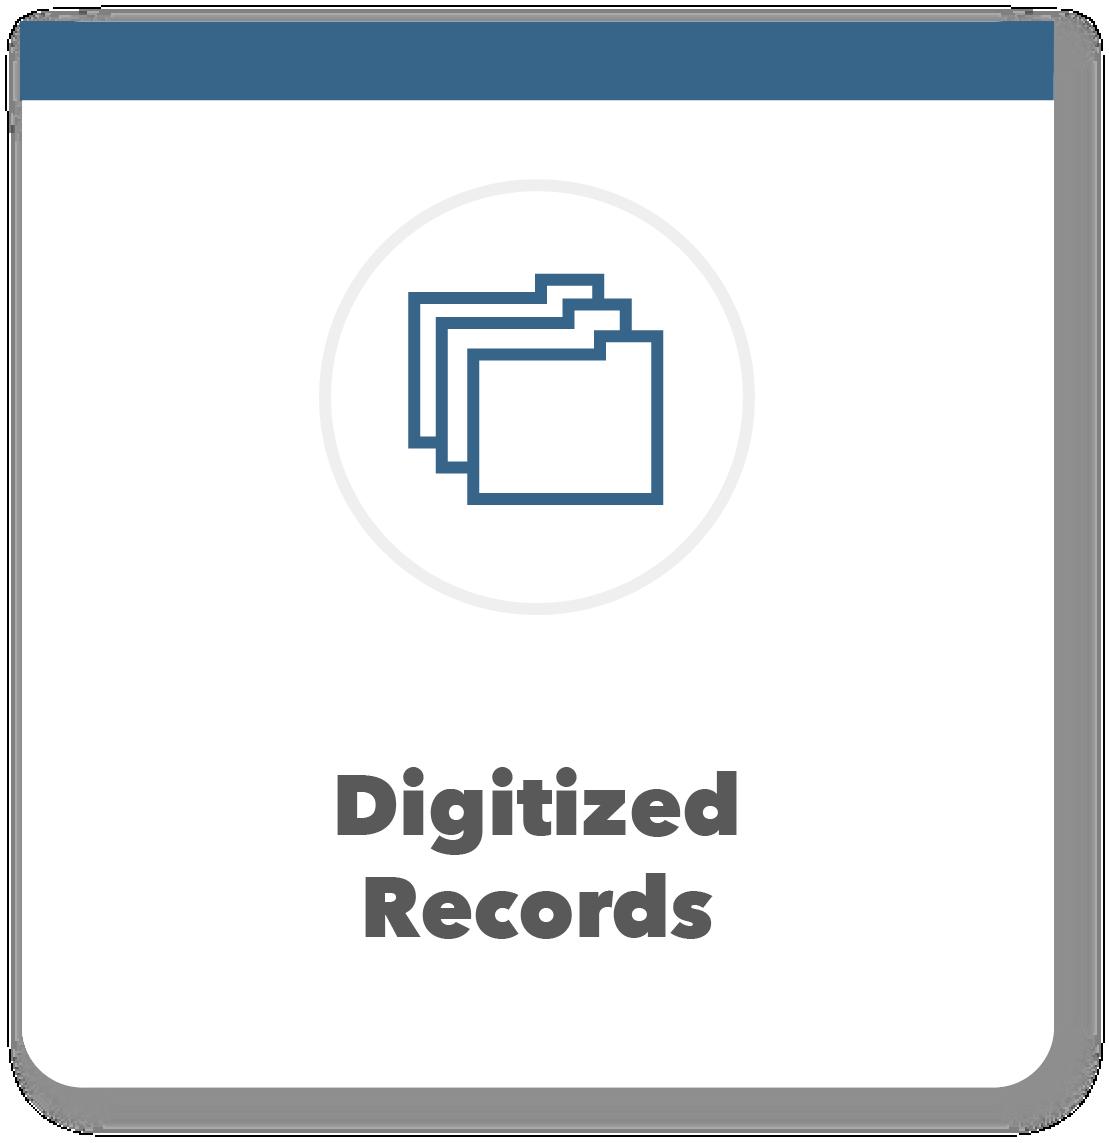 Digitized Records